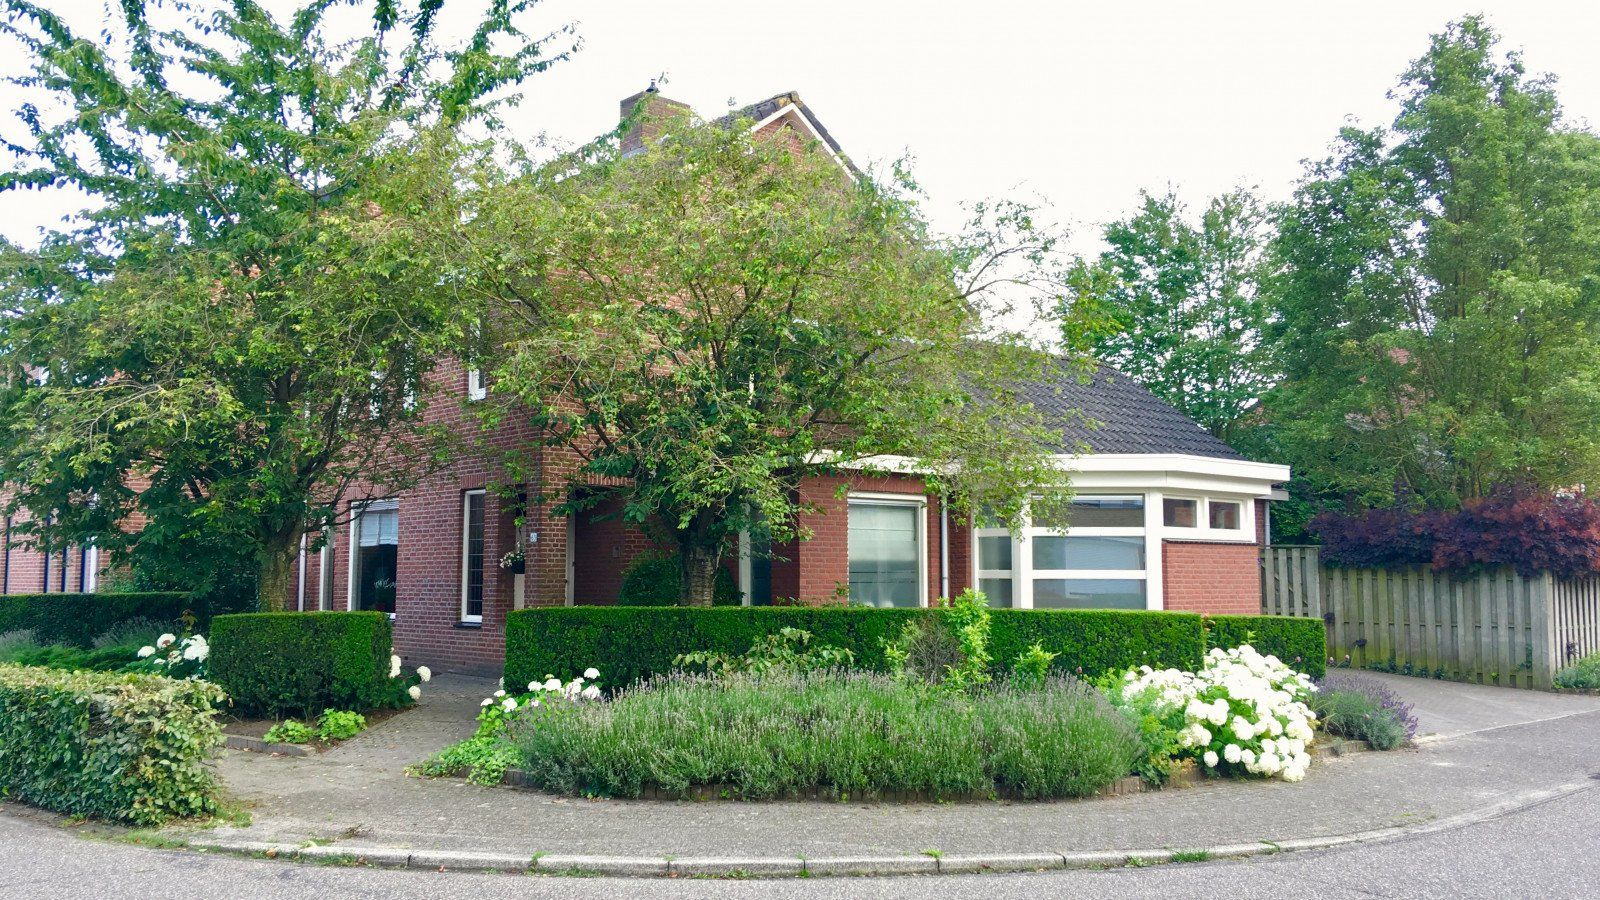 Veldstraat, Stramproy